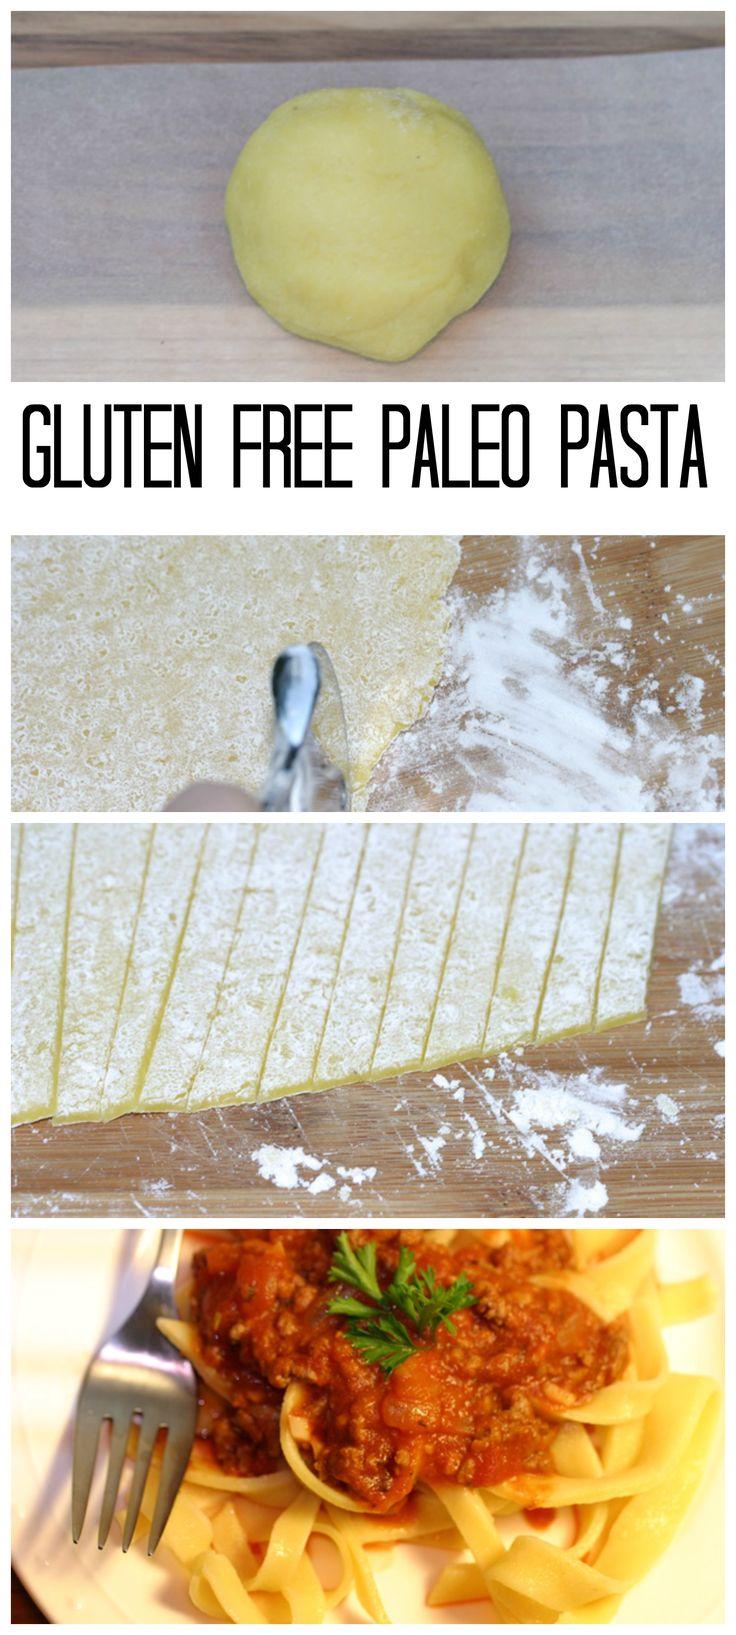 gluten free paleo pasta